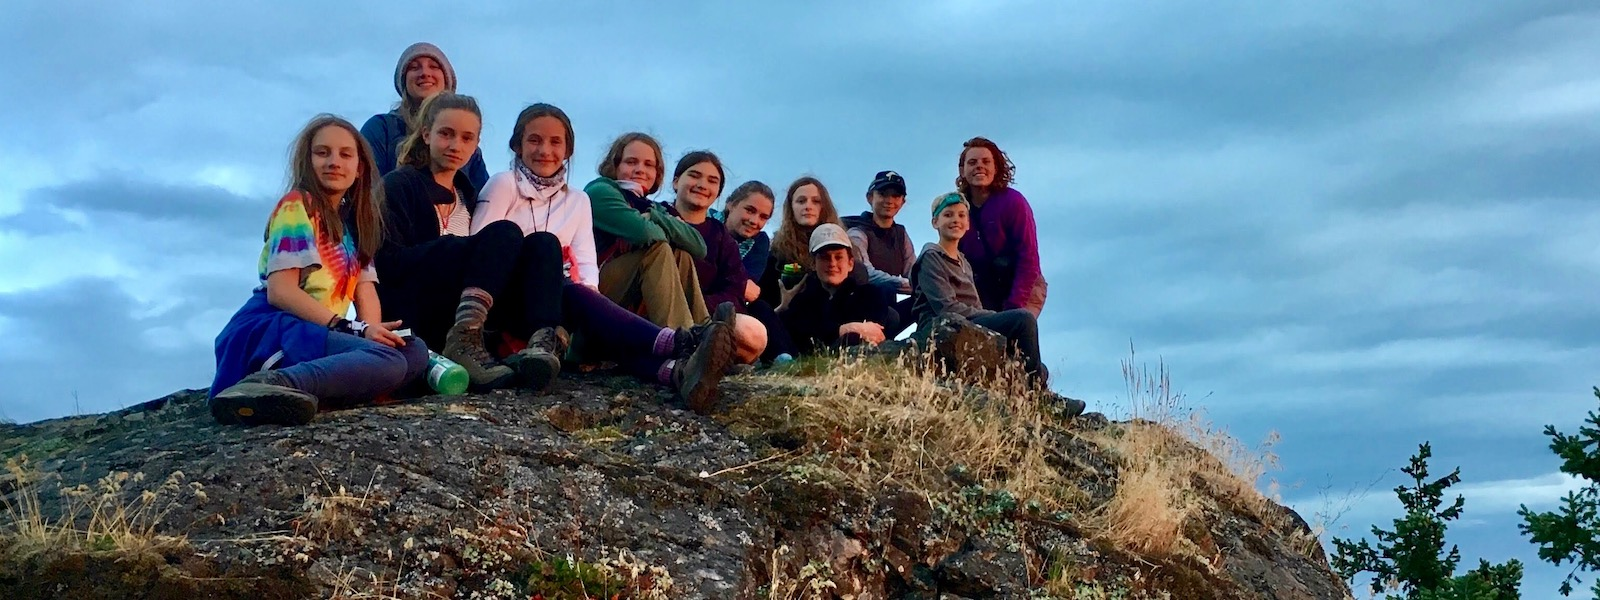 Coastal Backpacking Camp for Girls in Washington